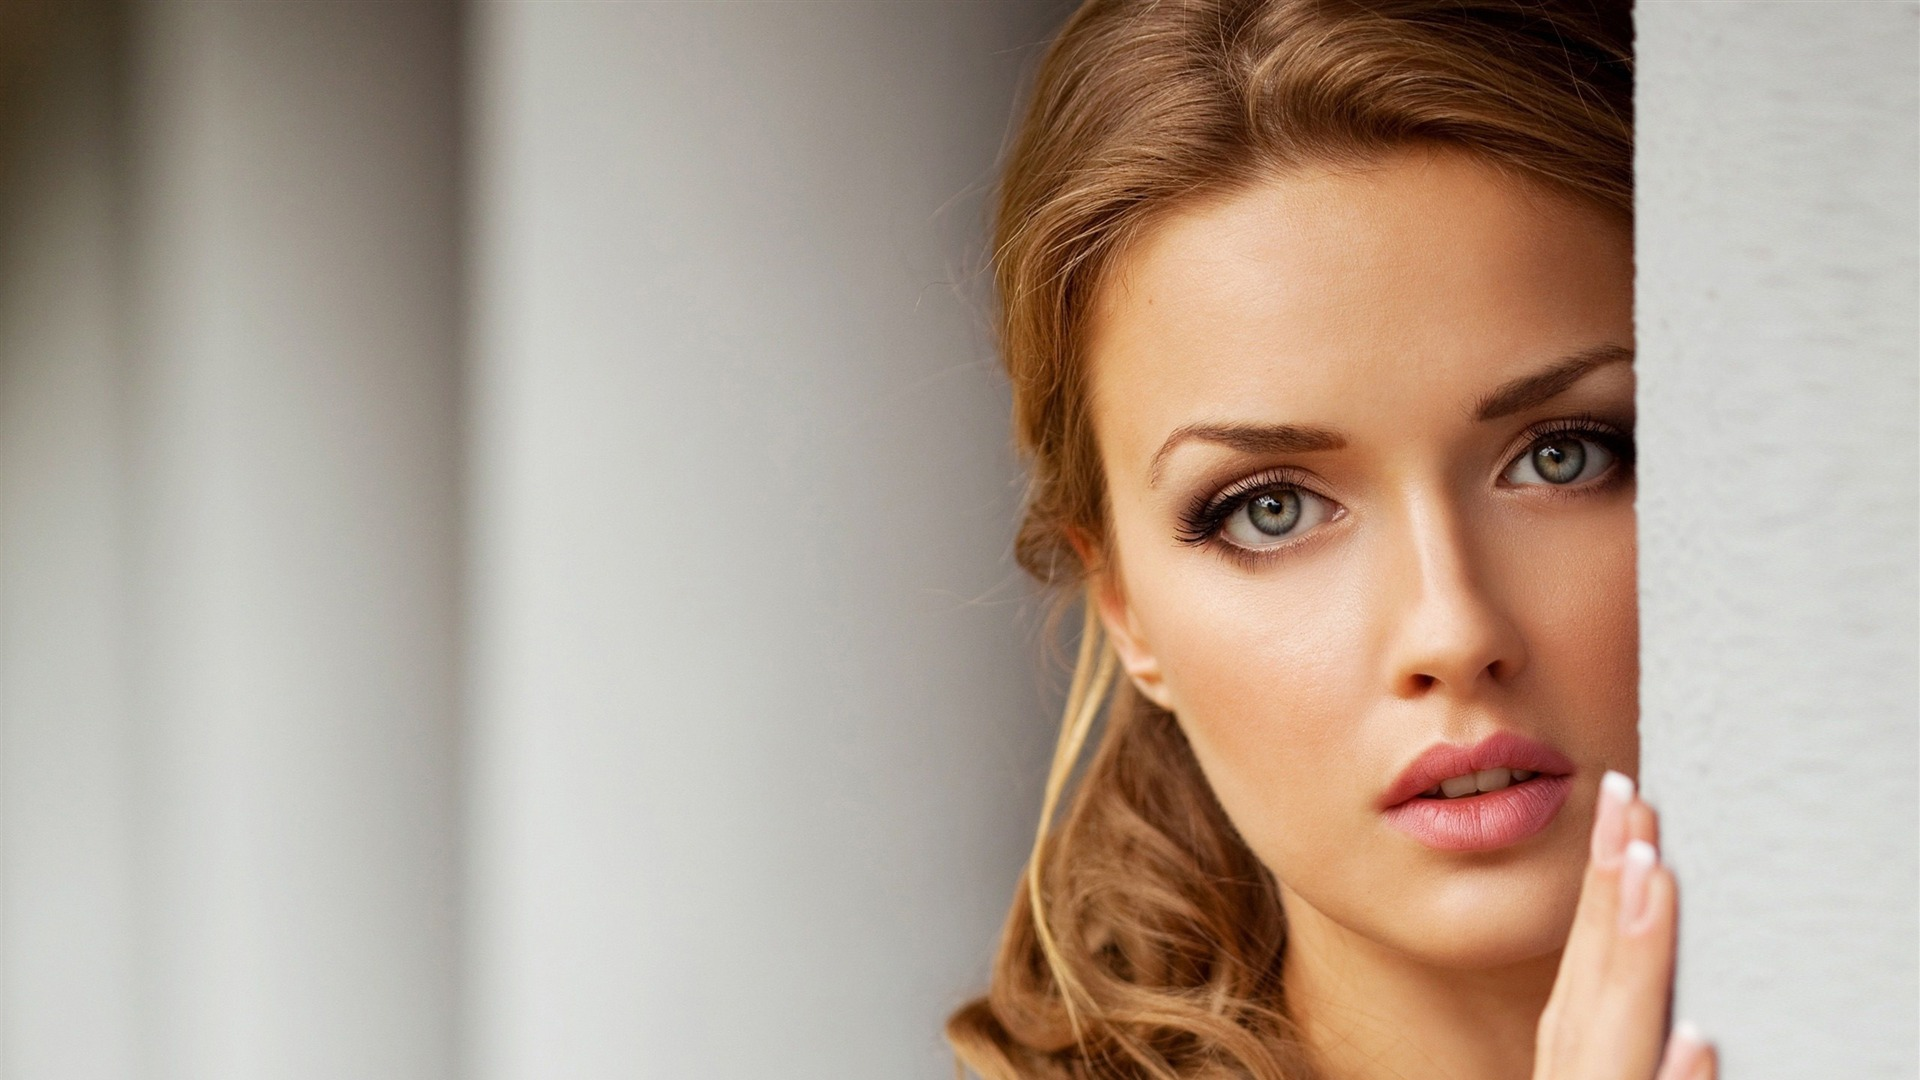 Más Hermosa Mujer Foto Hd Wallpapers Avance 10wallpapercom